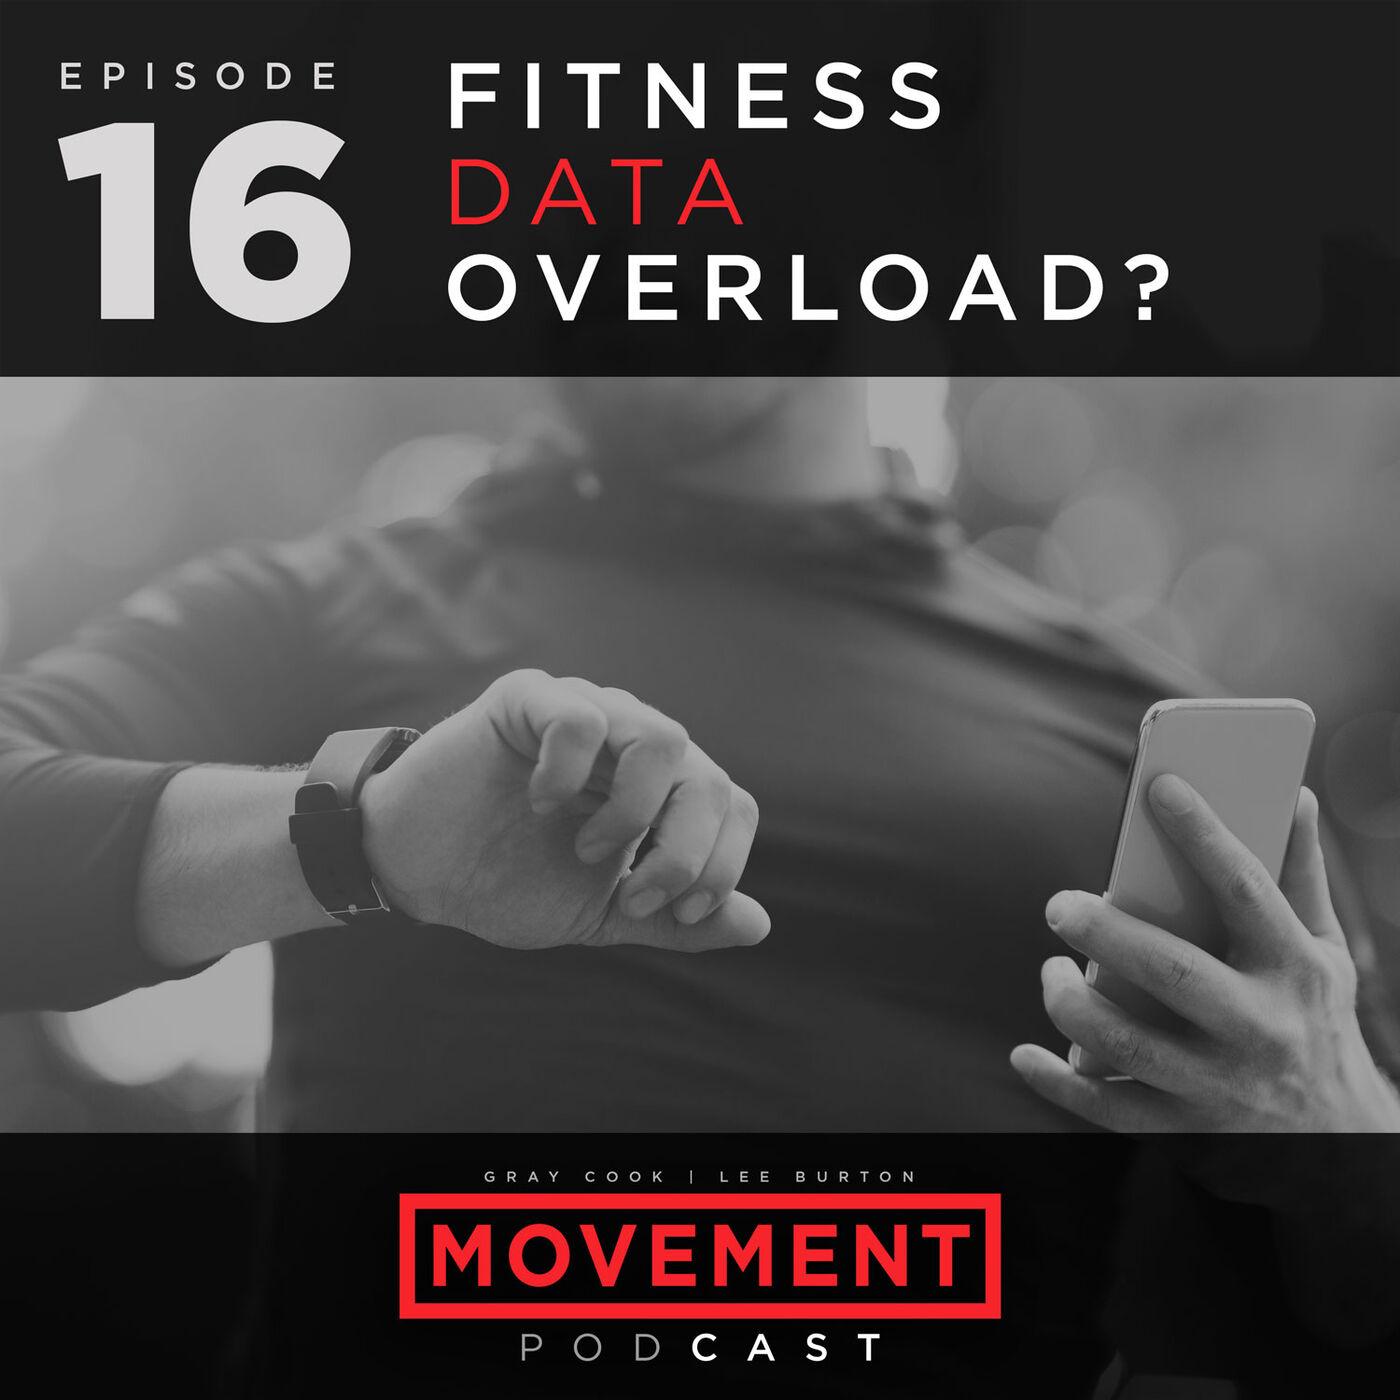 Fitness Data Overload?